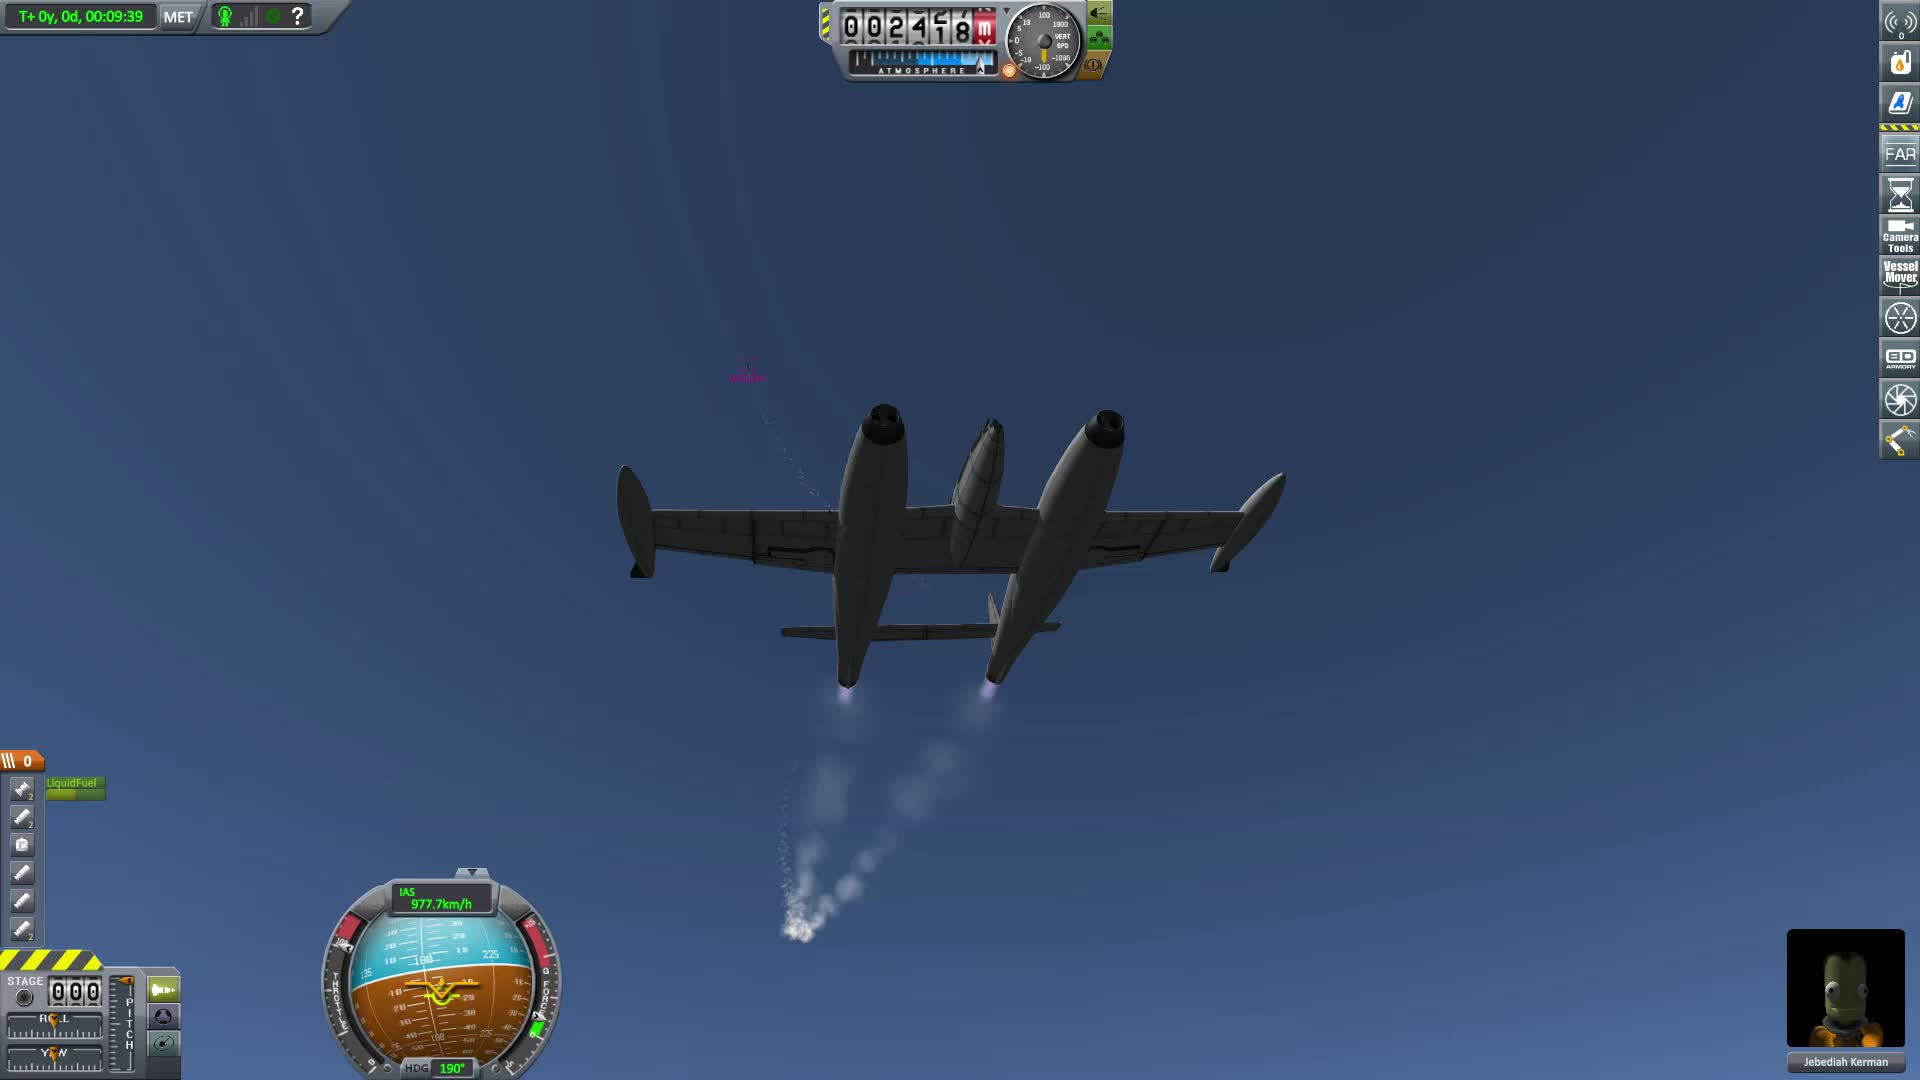 BDArmoury, Dogfight, KSP, Kerbal Space Program, Turbo Lightning vs La-200 GIFs